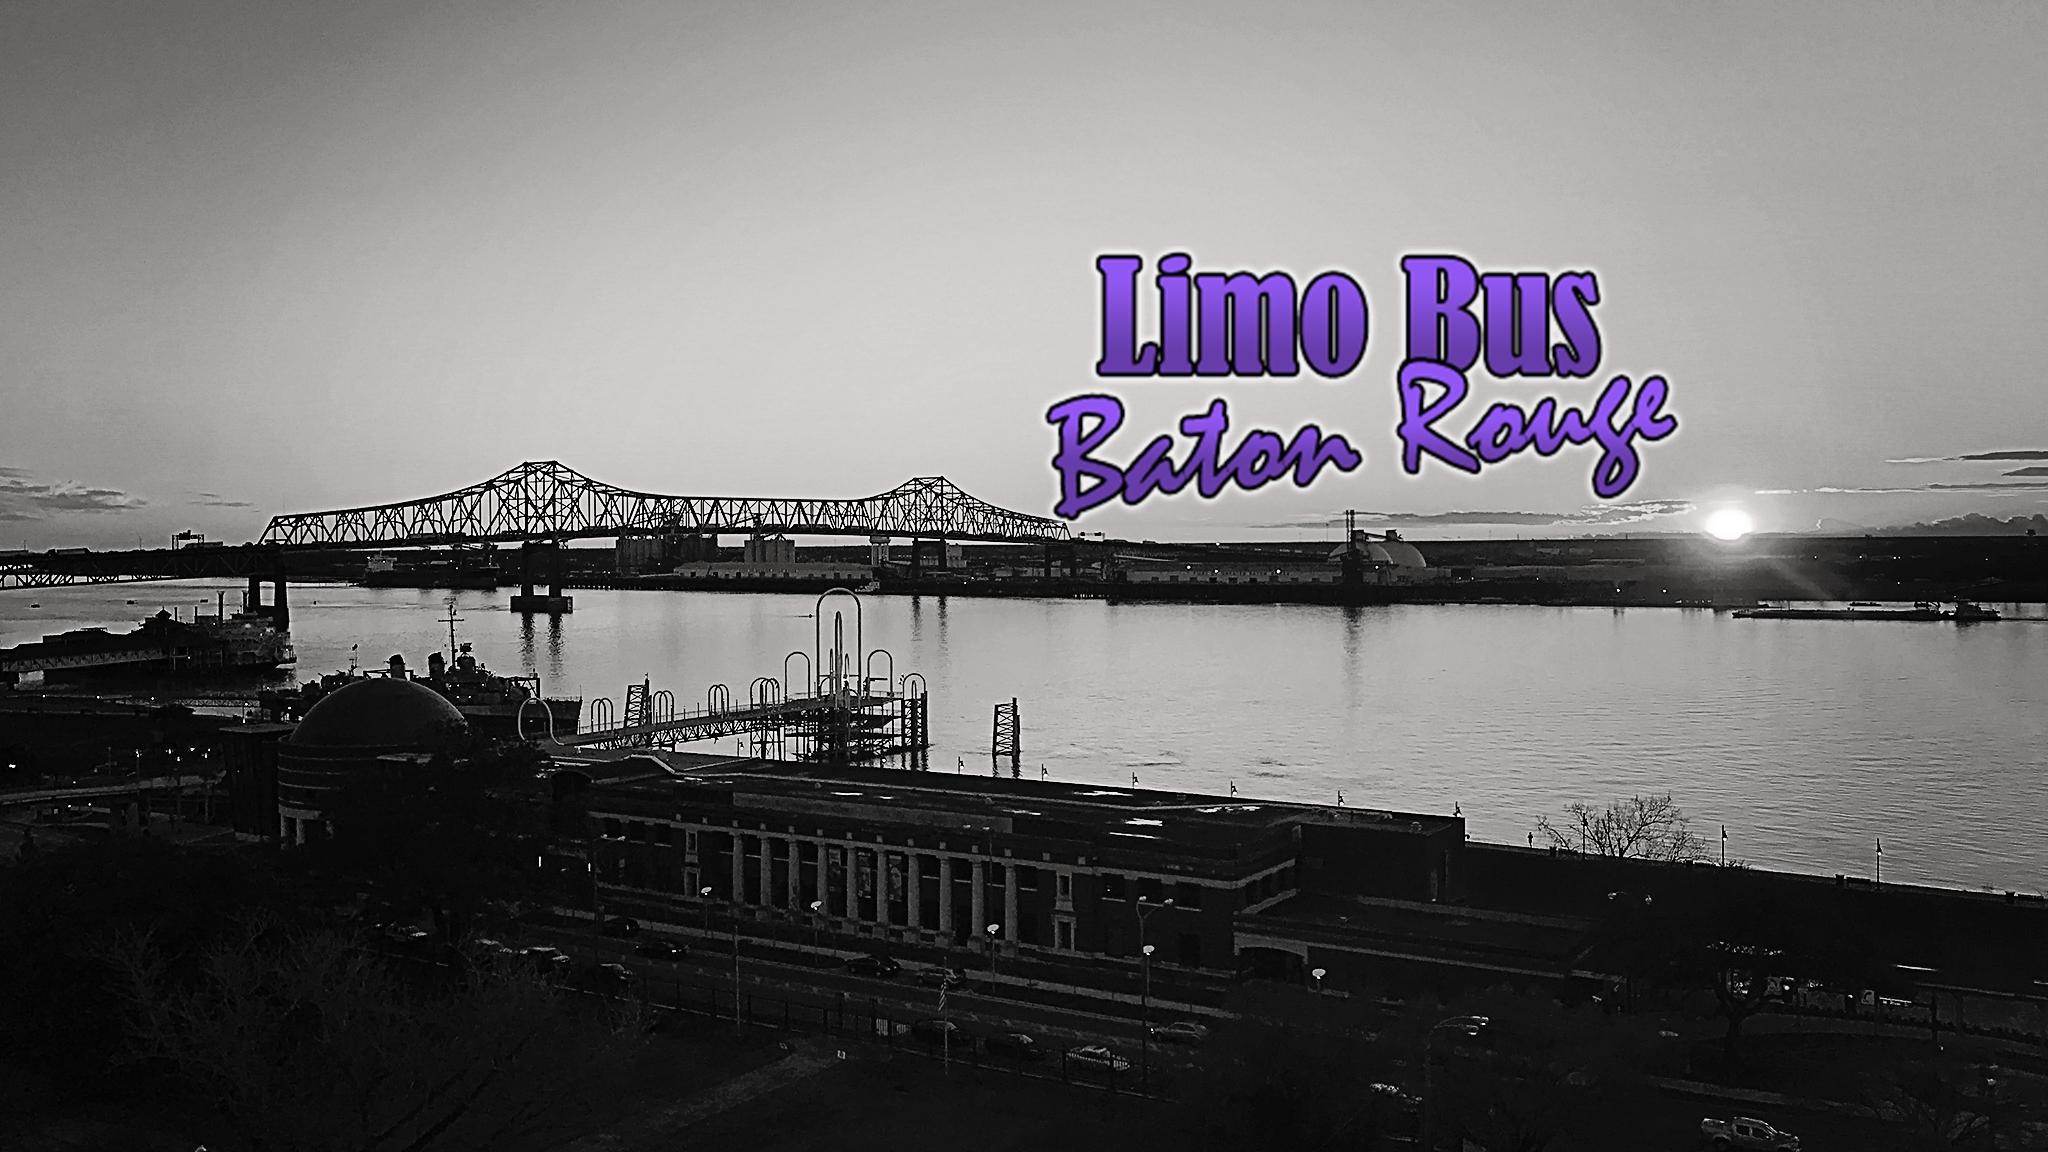 Limo Bus Baton Rouge (@limobusbatonrouge) Cover Image